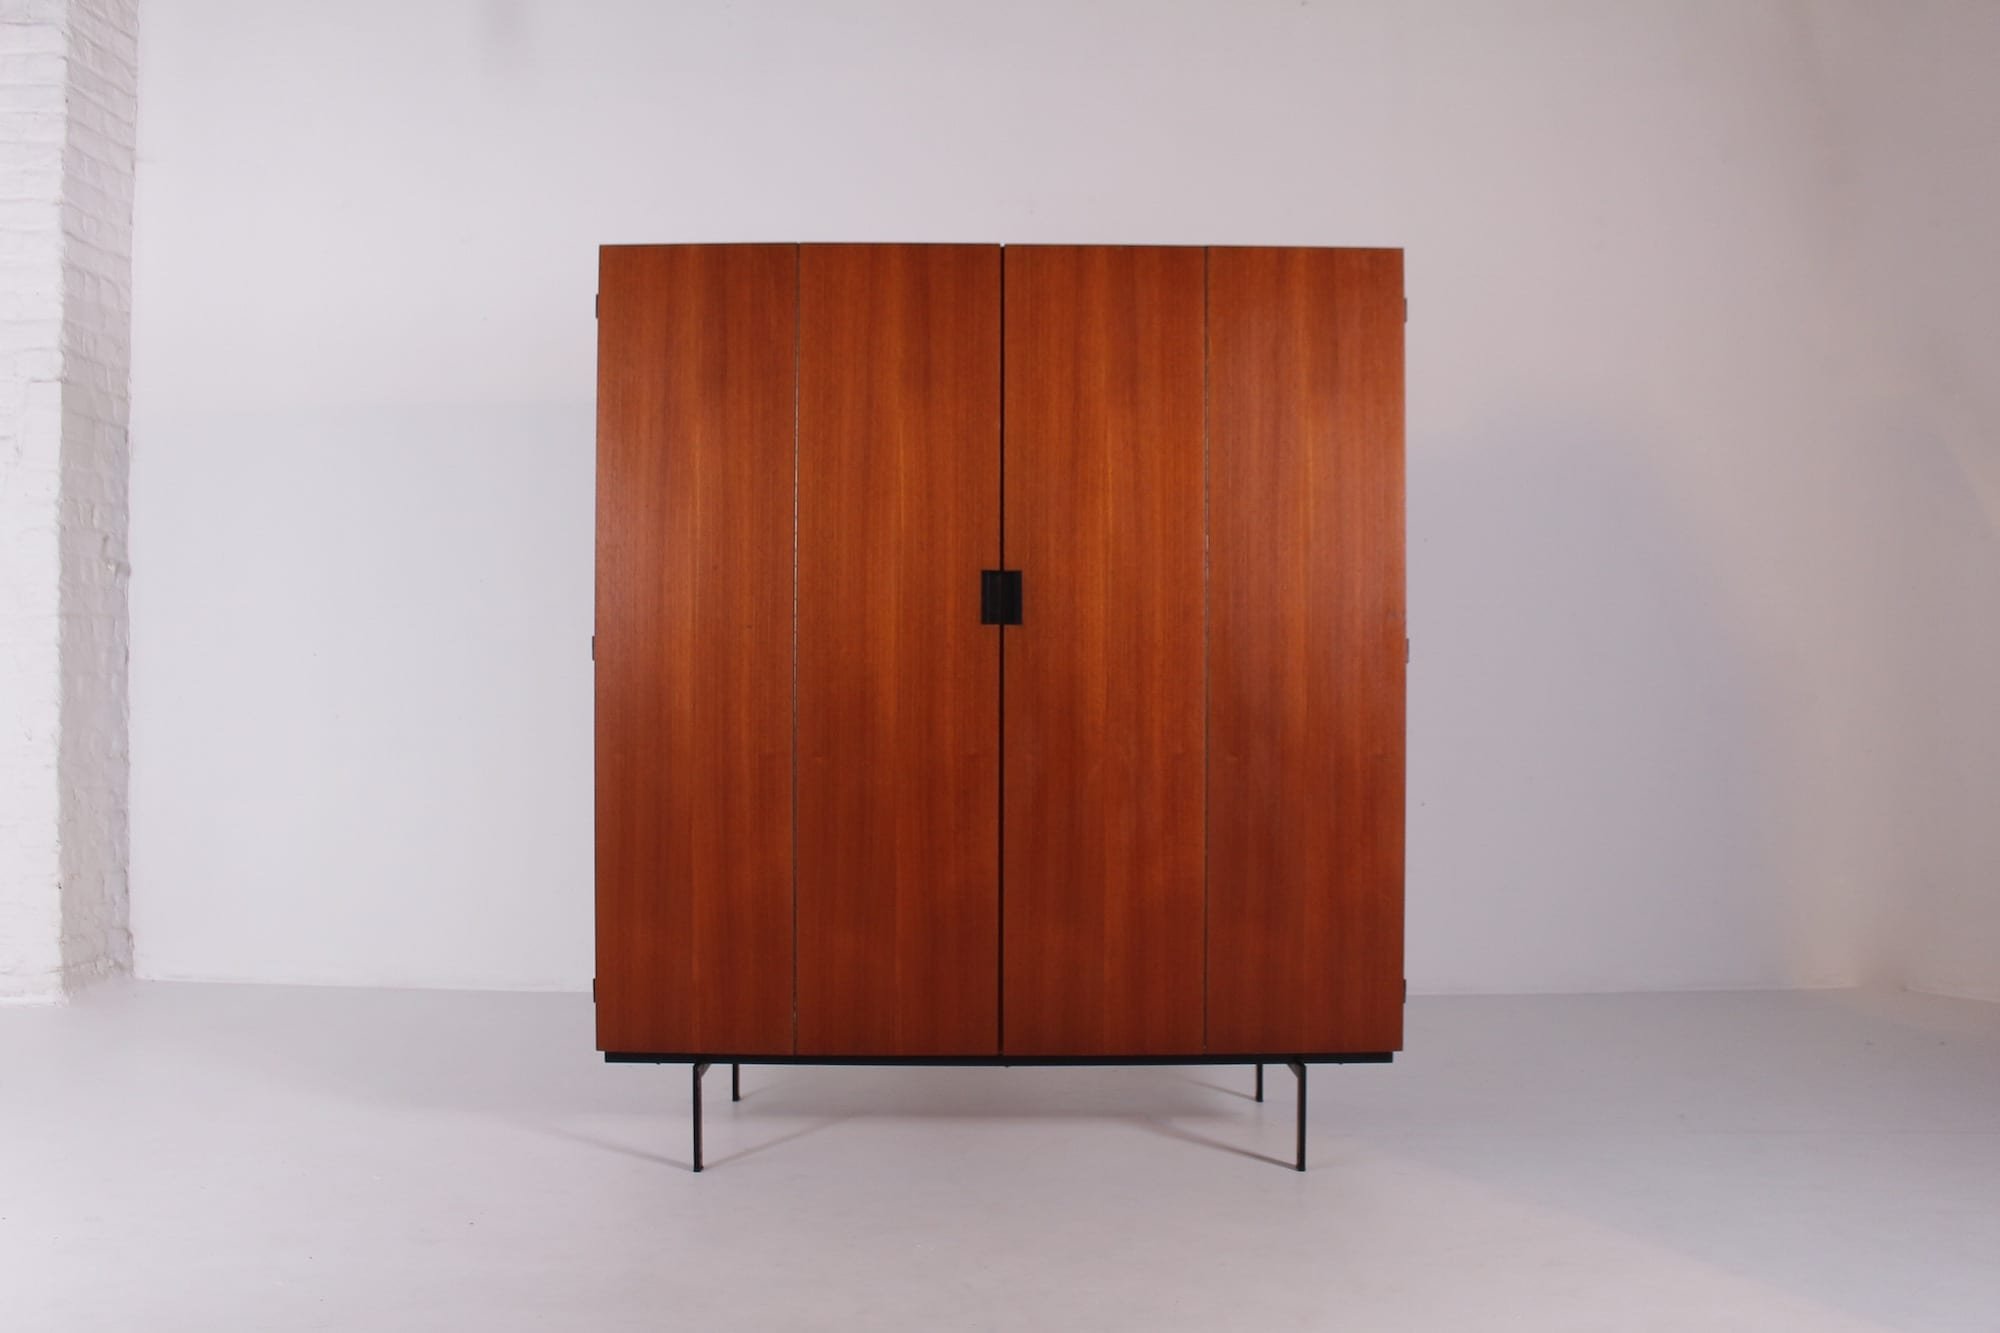 garde robe japanese serie cees braakman meubles vintage li ge. Black Bedroom Furniture Sets. Home Design Ideas